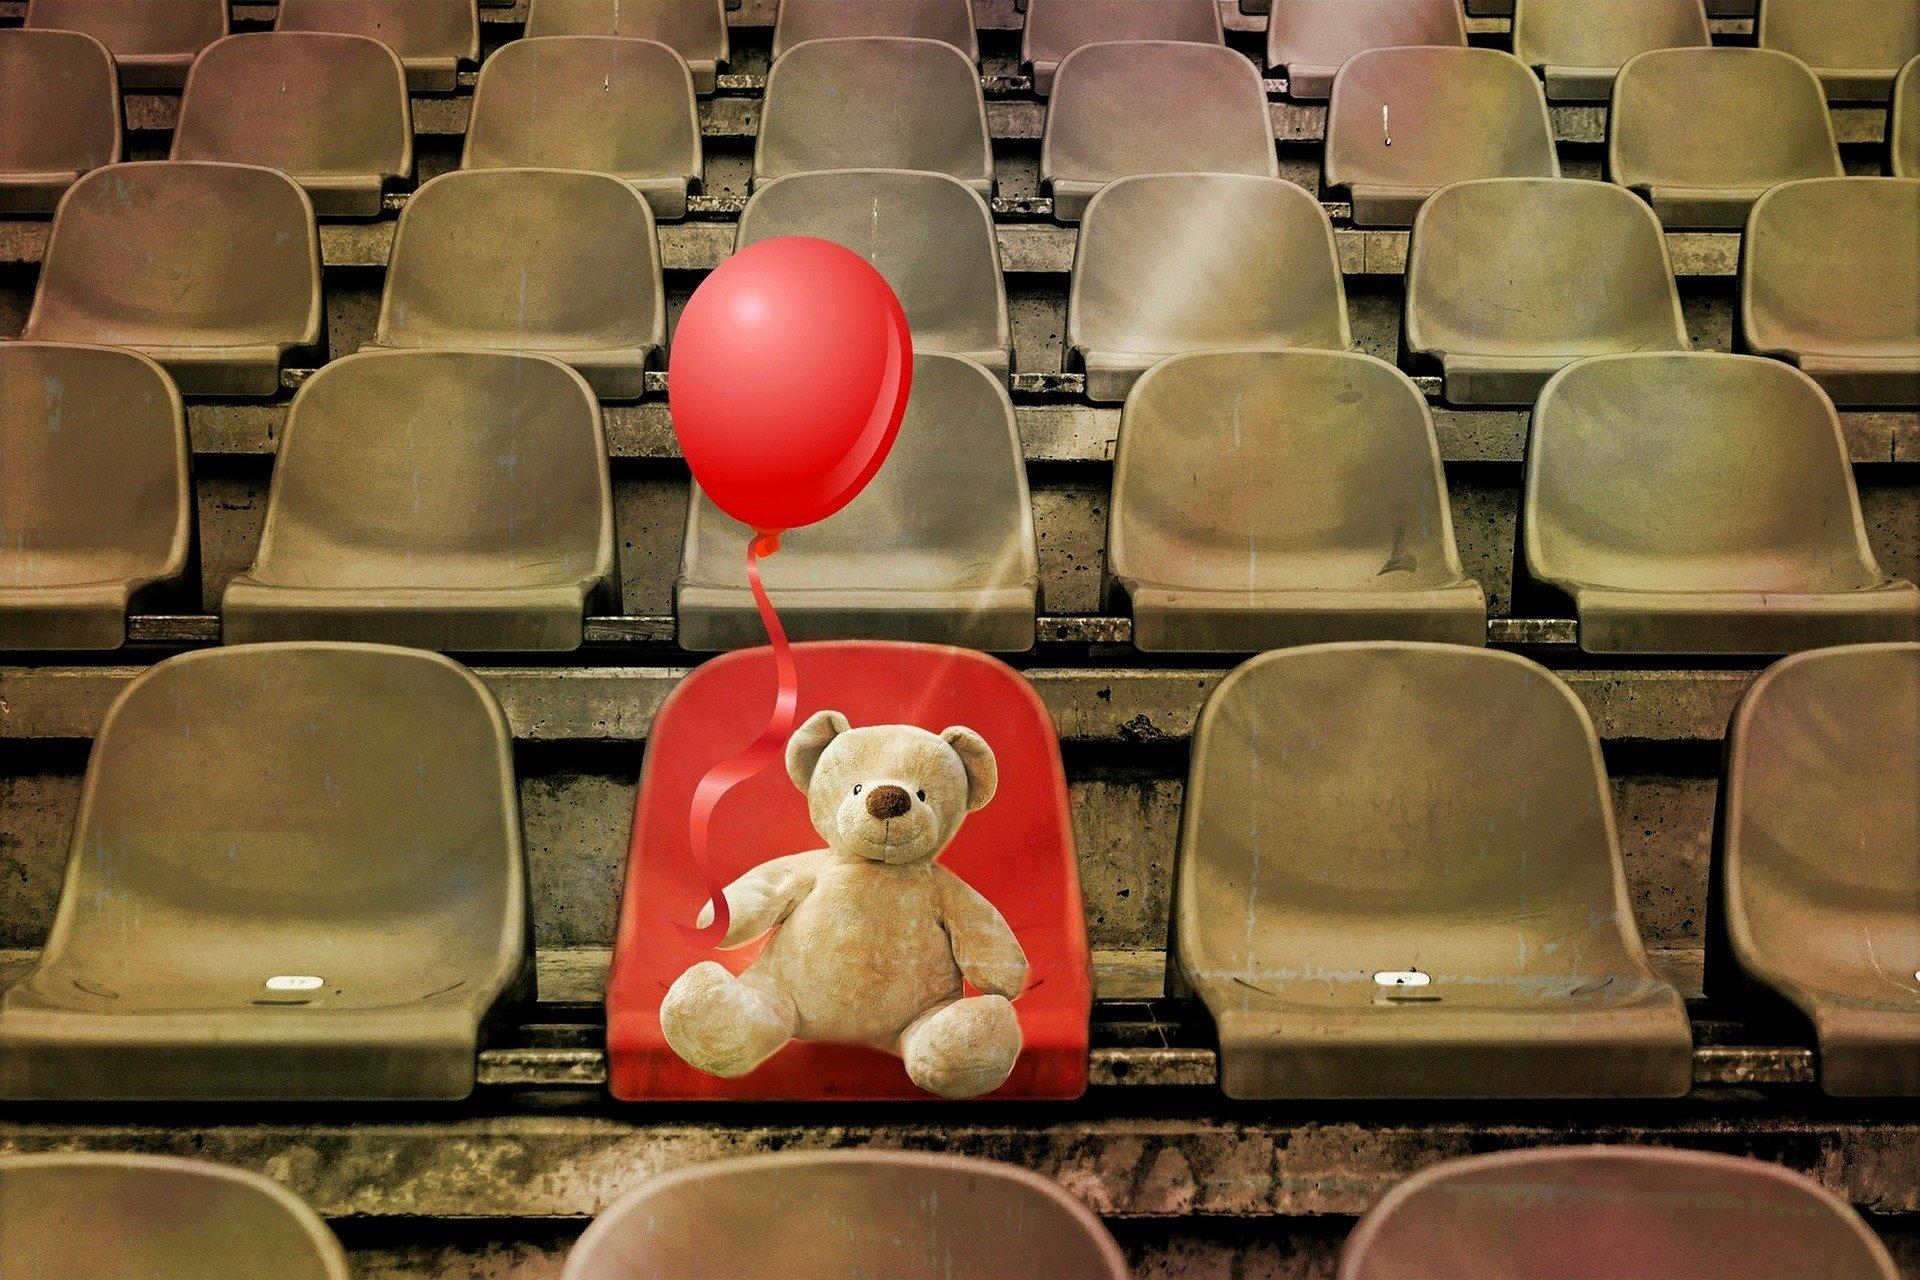 un orsacchiotto che tiene in mano un palloncino seduto su una sedia rossa tra le altre sedie nocciola allo stadio